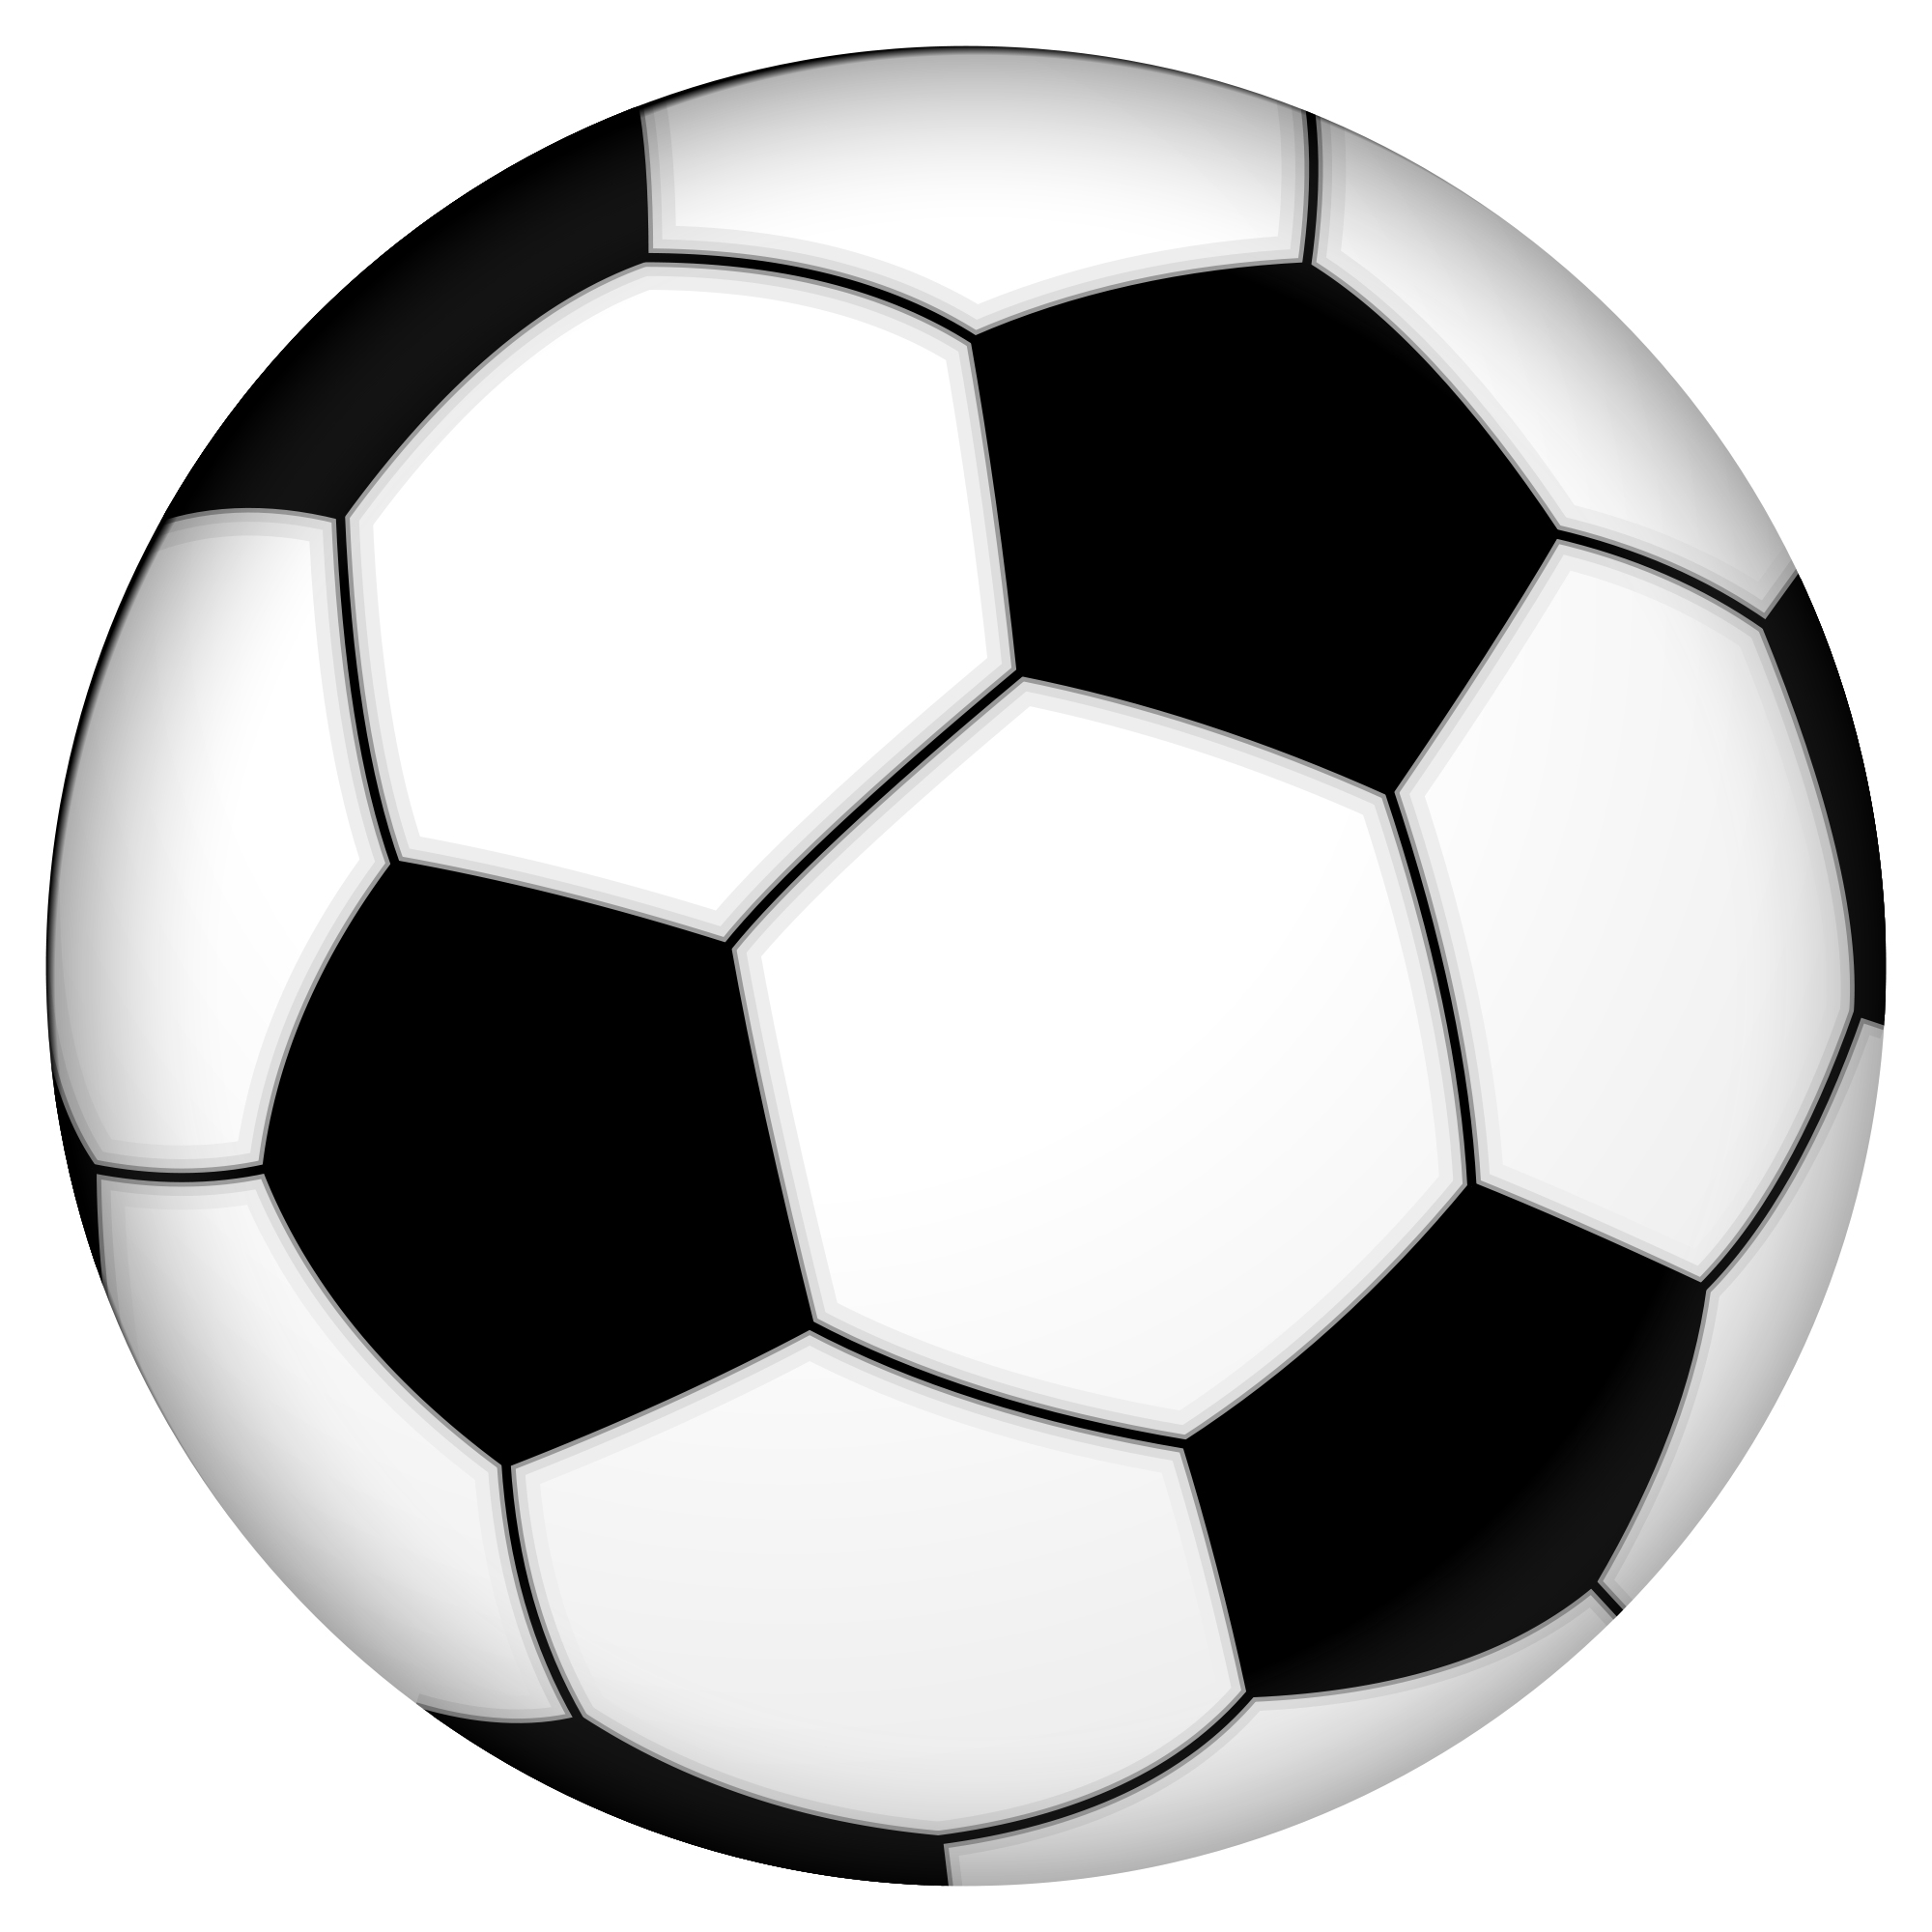 2000x2000 Kicking Soccer Ball Clipart